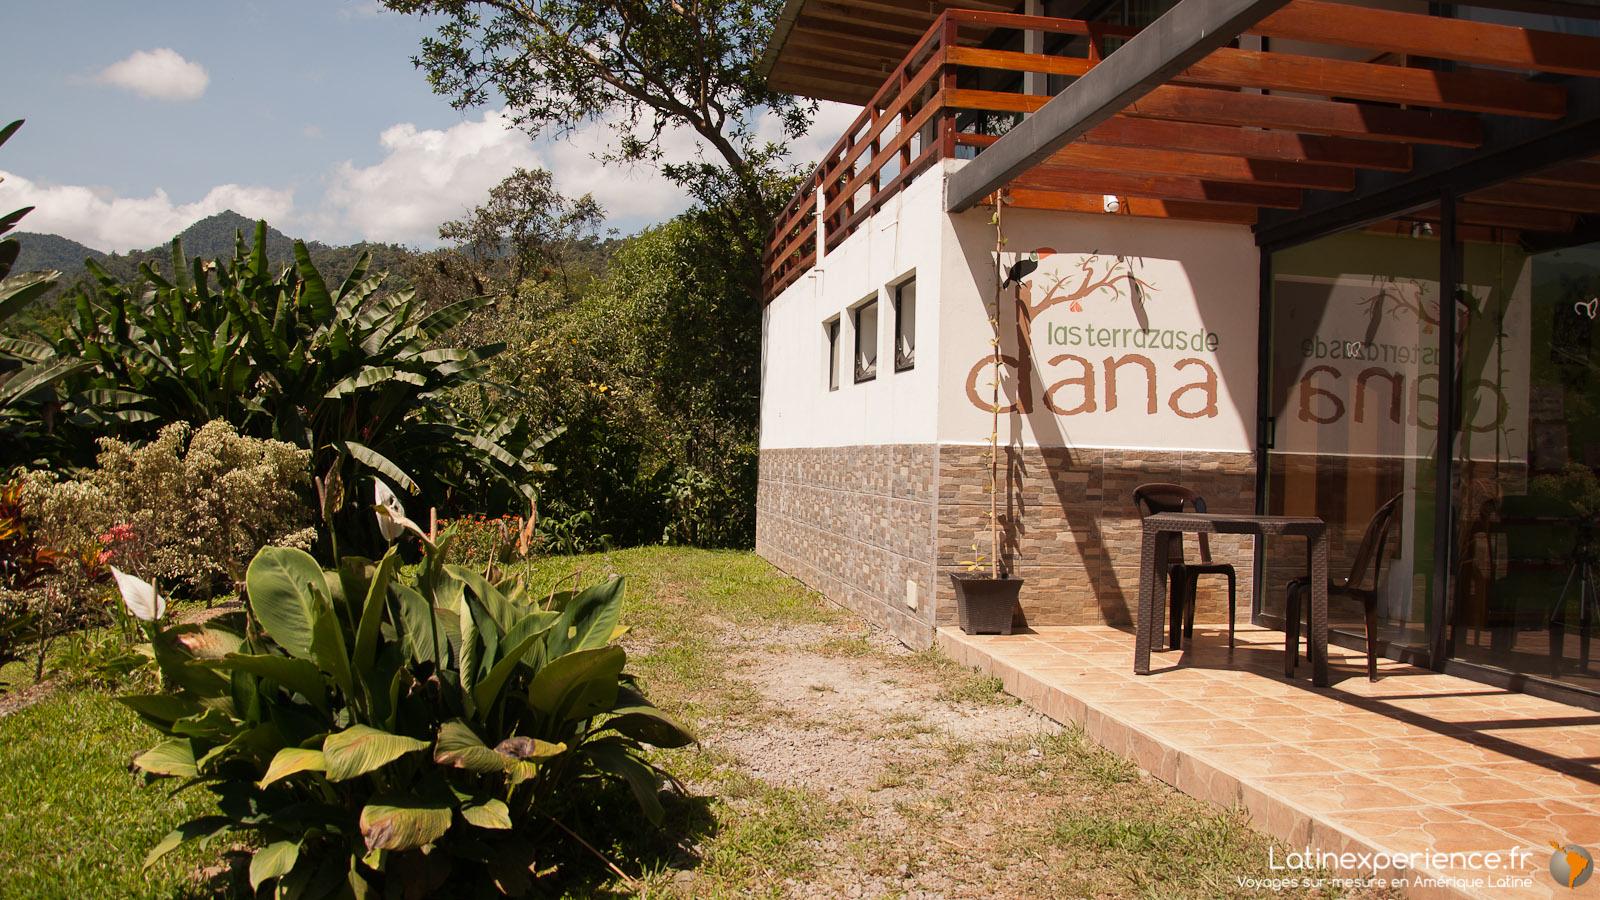 Equateur - Mindo - Hotel - Las Terrazas de Dana - voyage photo - Latinexperience voyages